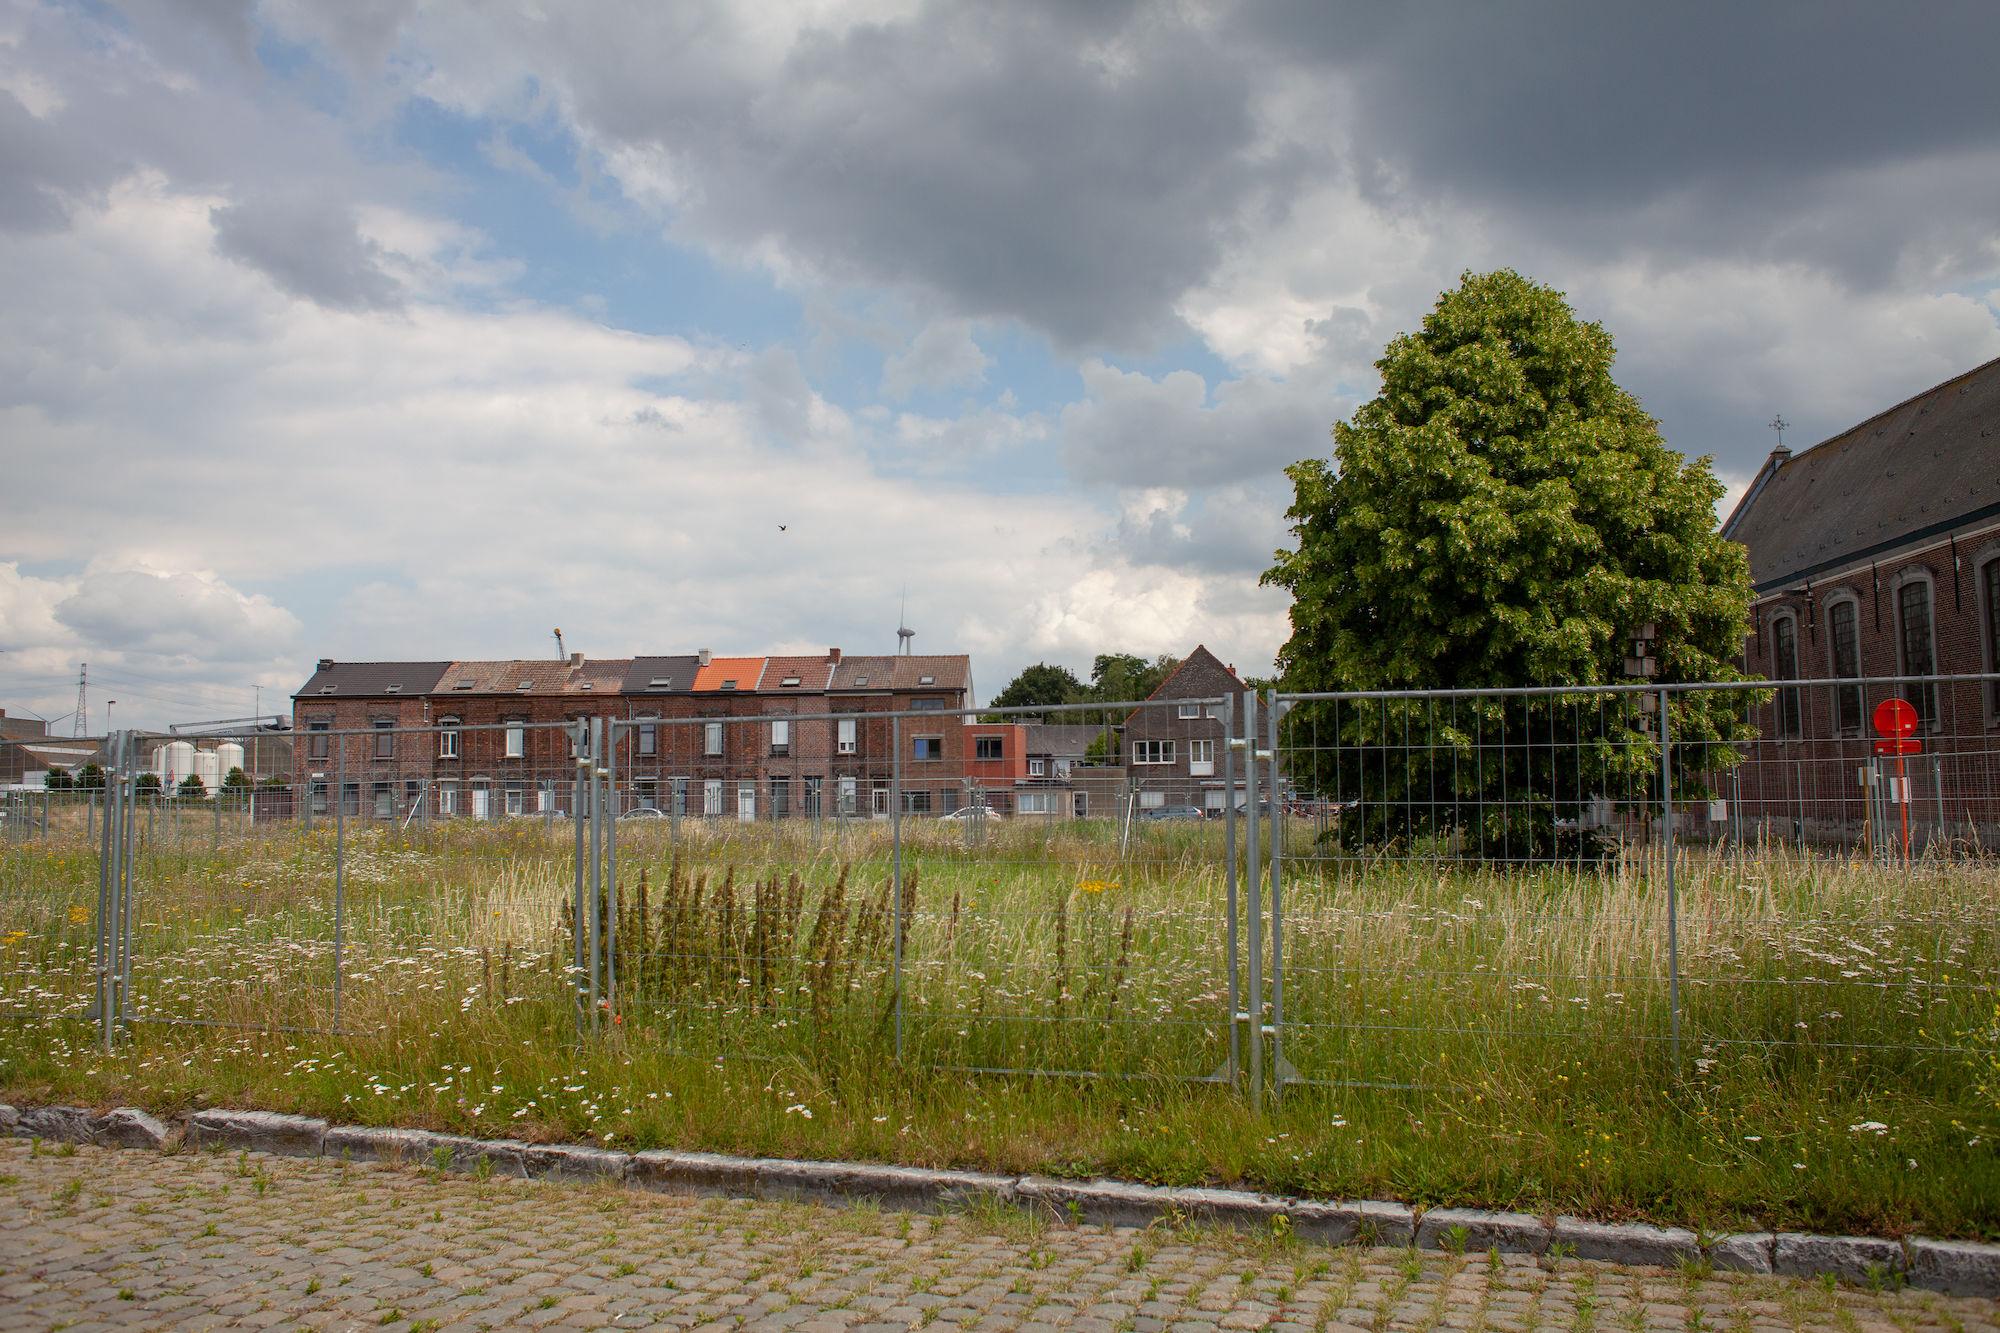 2019-07-02 Muide Meulestede prospectie Wannes_stadsvernieuwing_IMG_0374-2.jpg